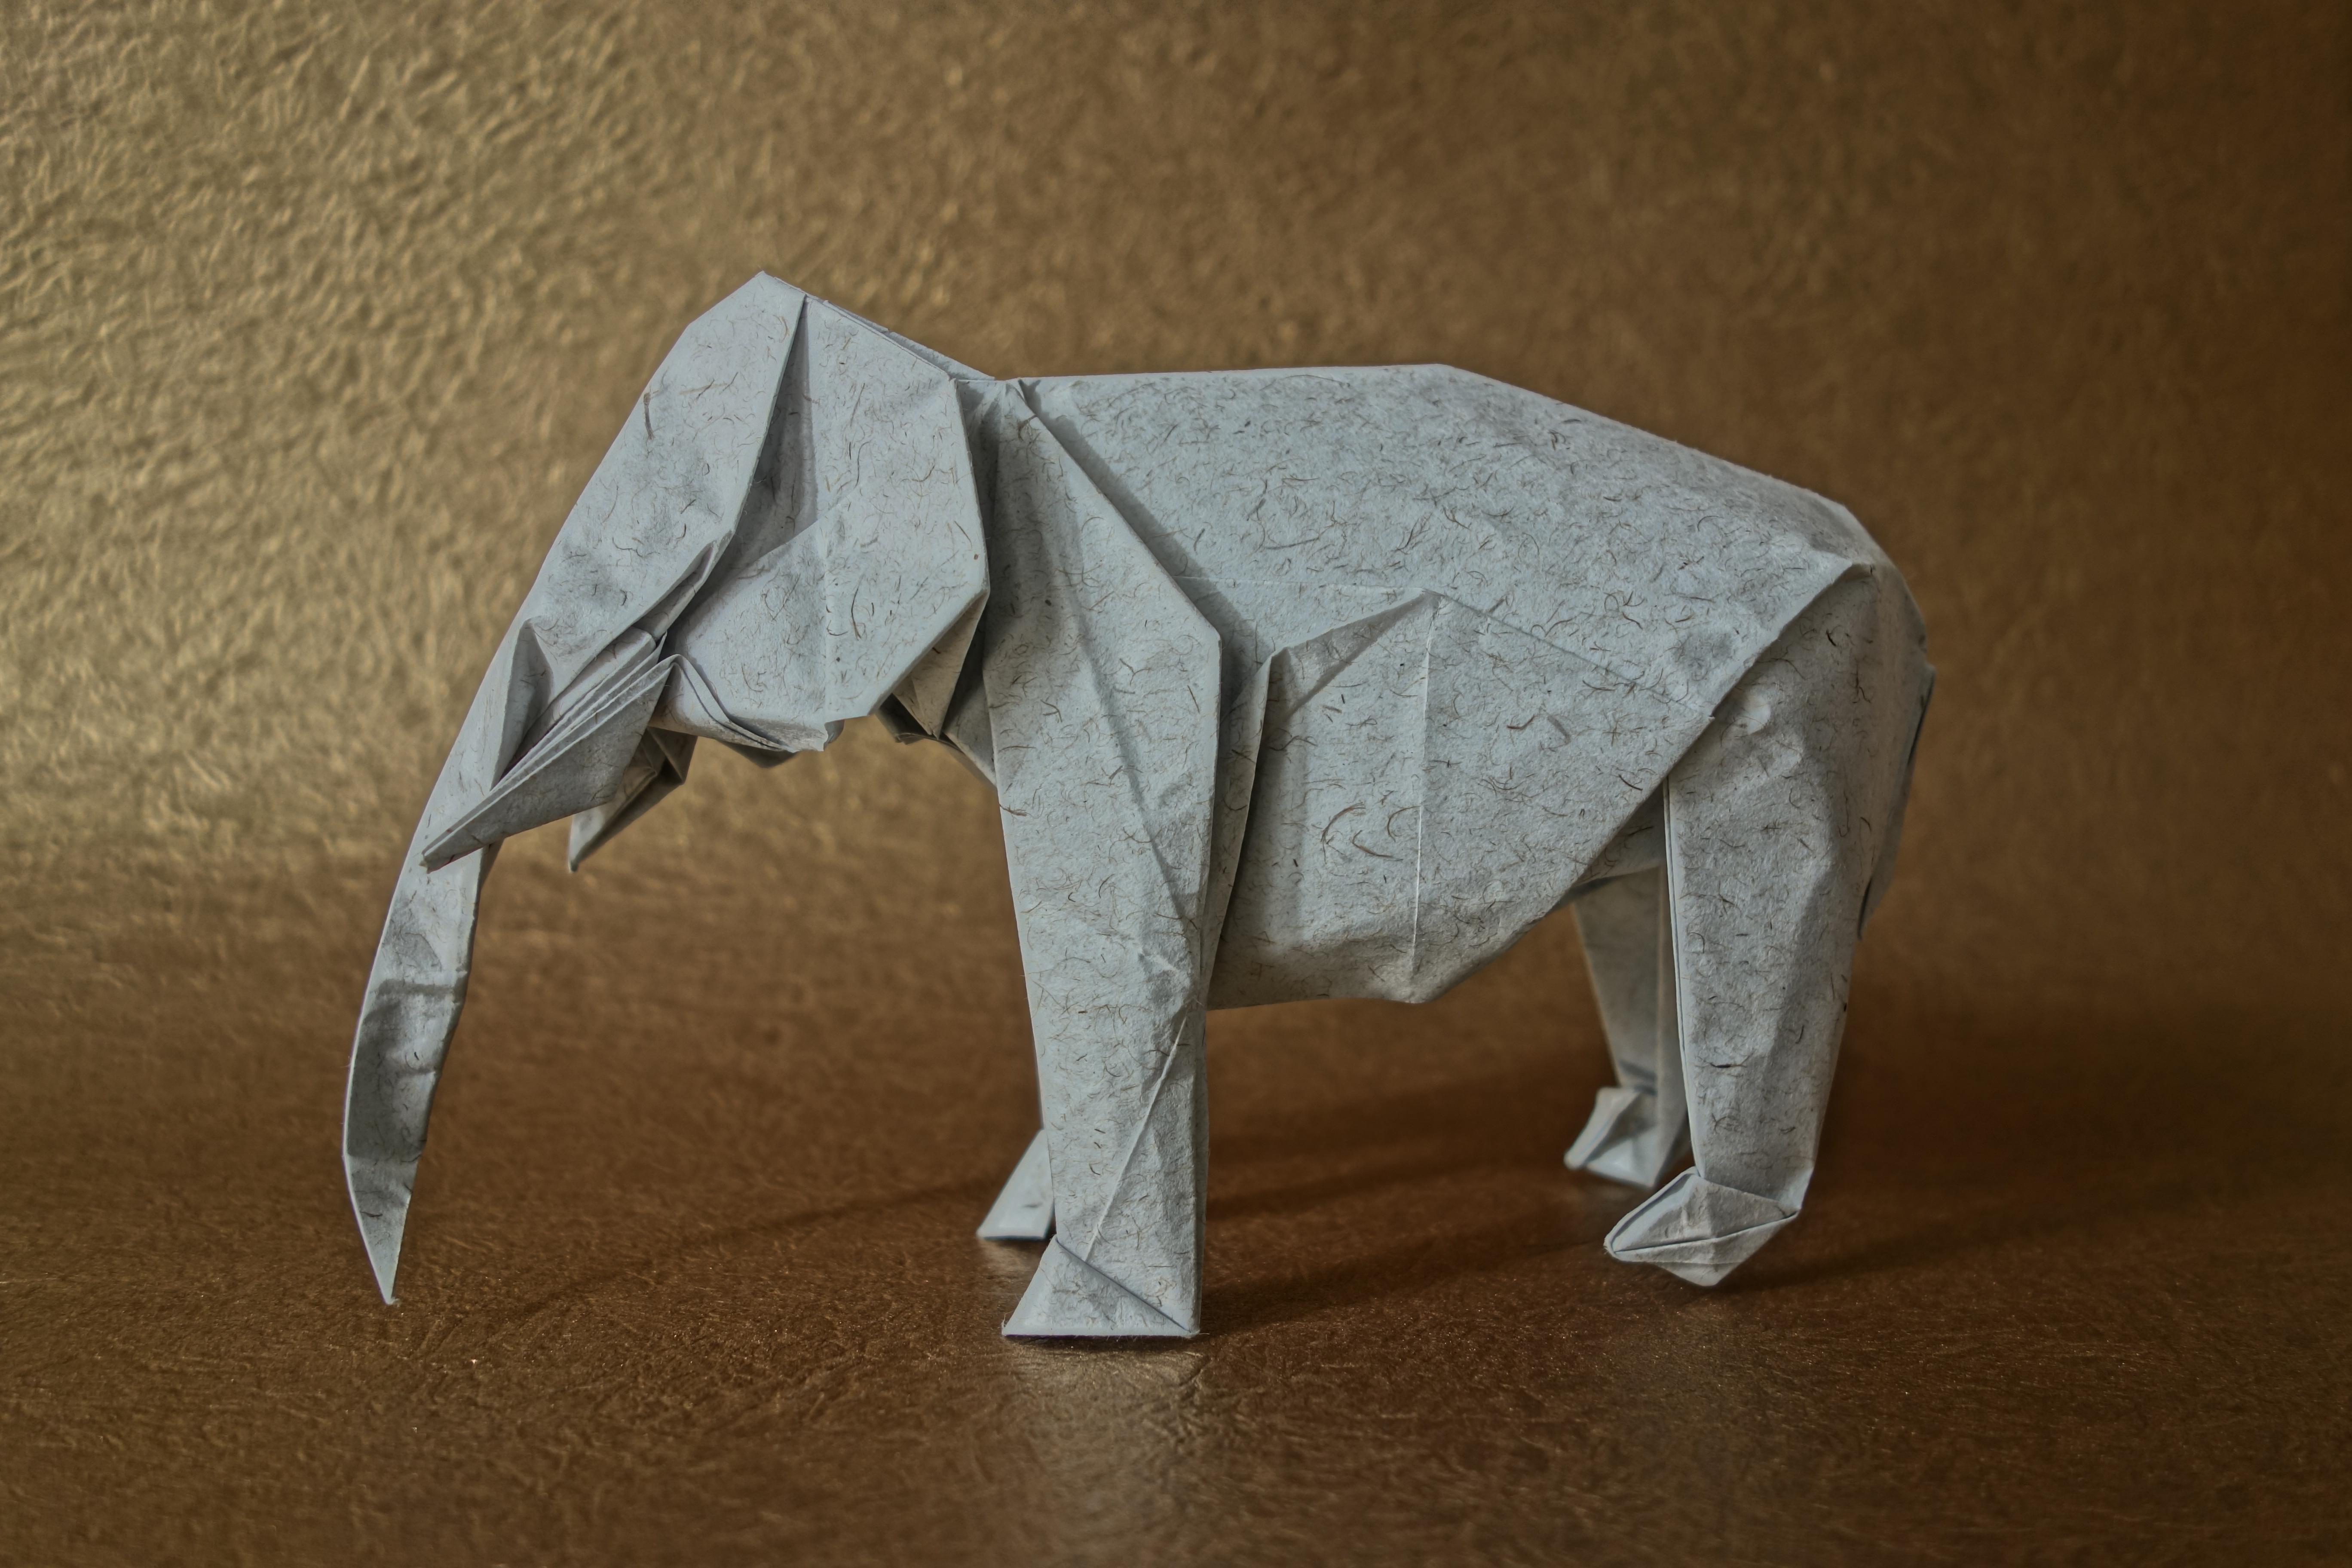 схема модульного оригами корабль от тарасова сергея